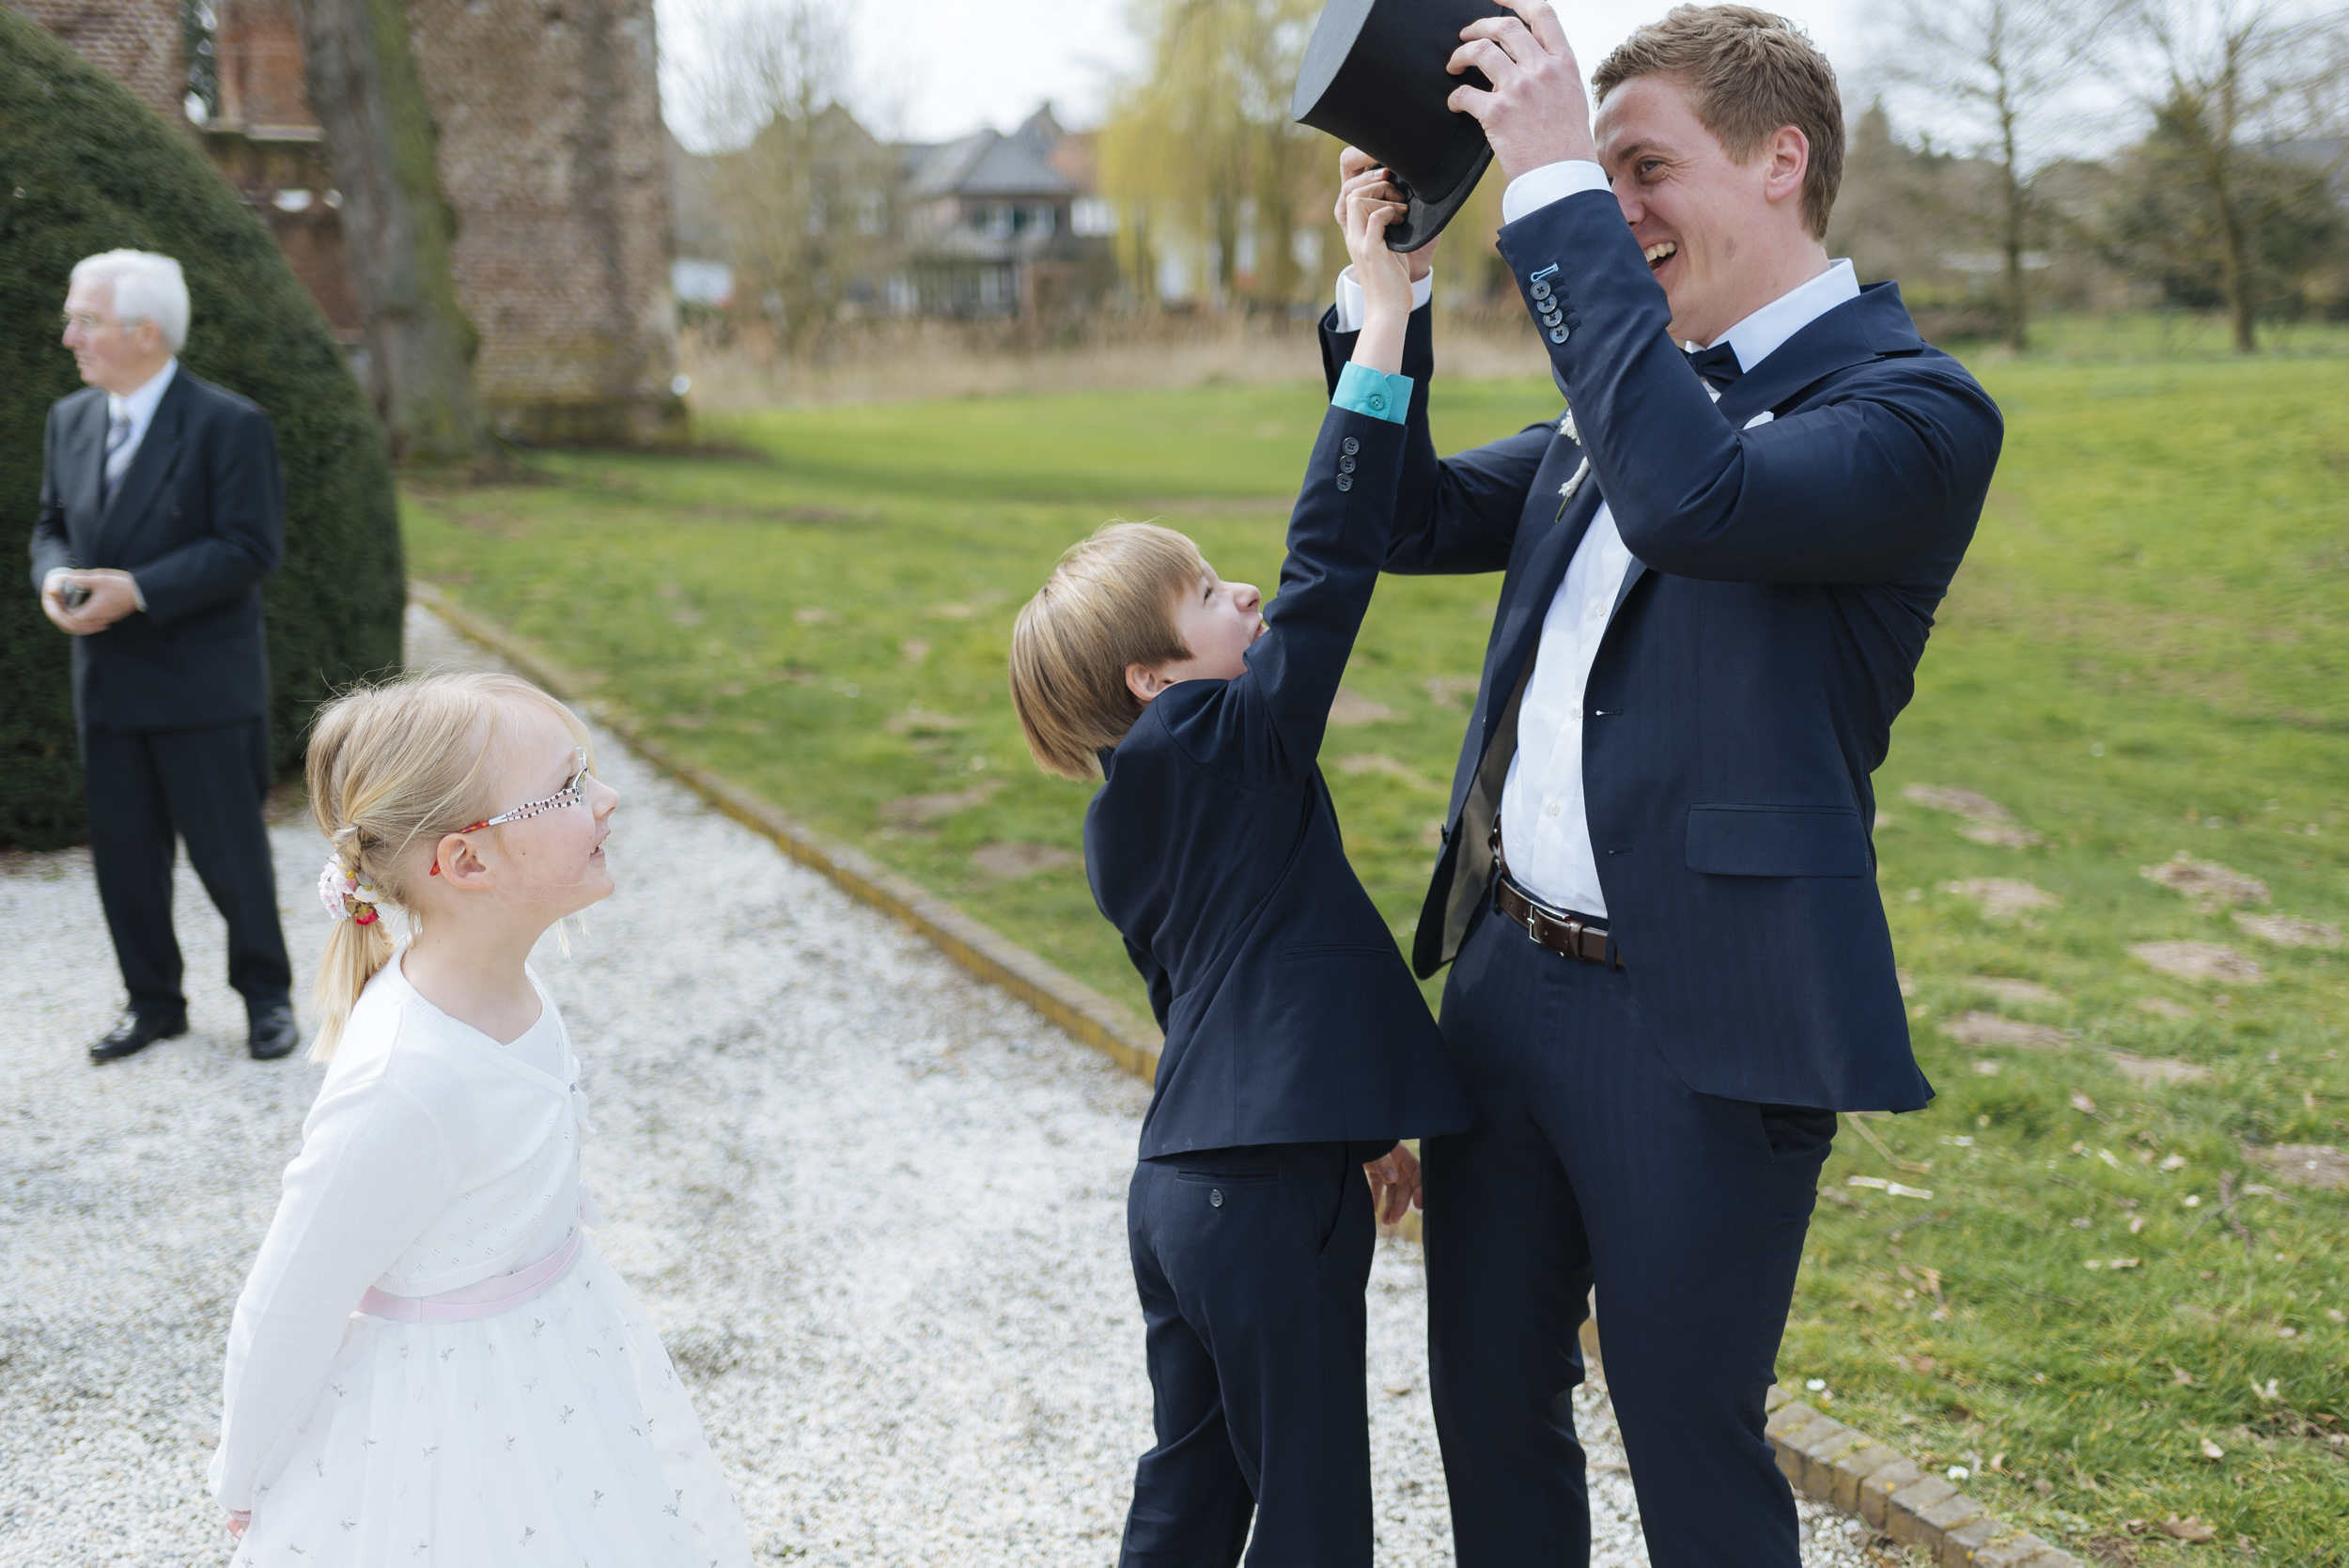 Hochzeitsfotograf-Schlossruine-Hertefeld-Weeze-048.jpg